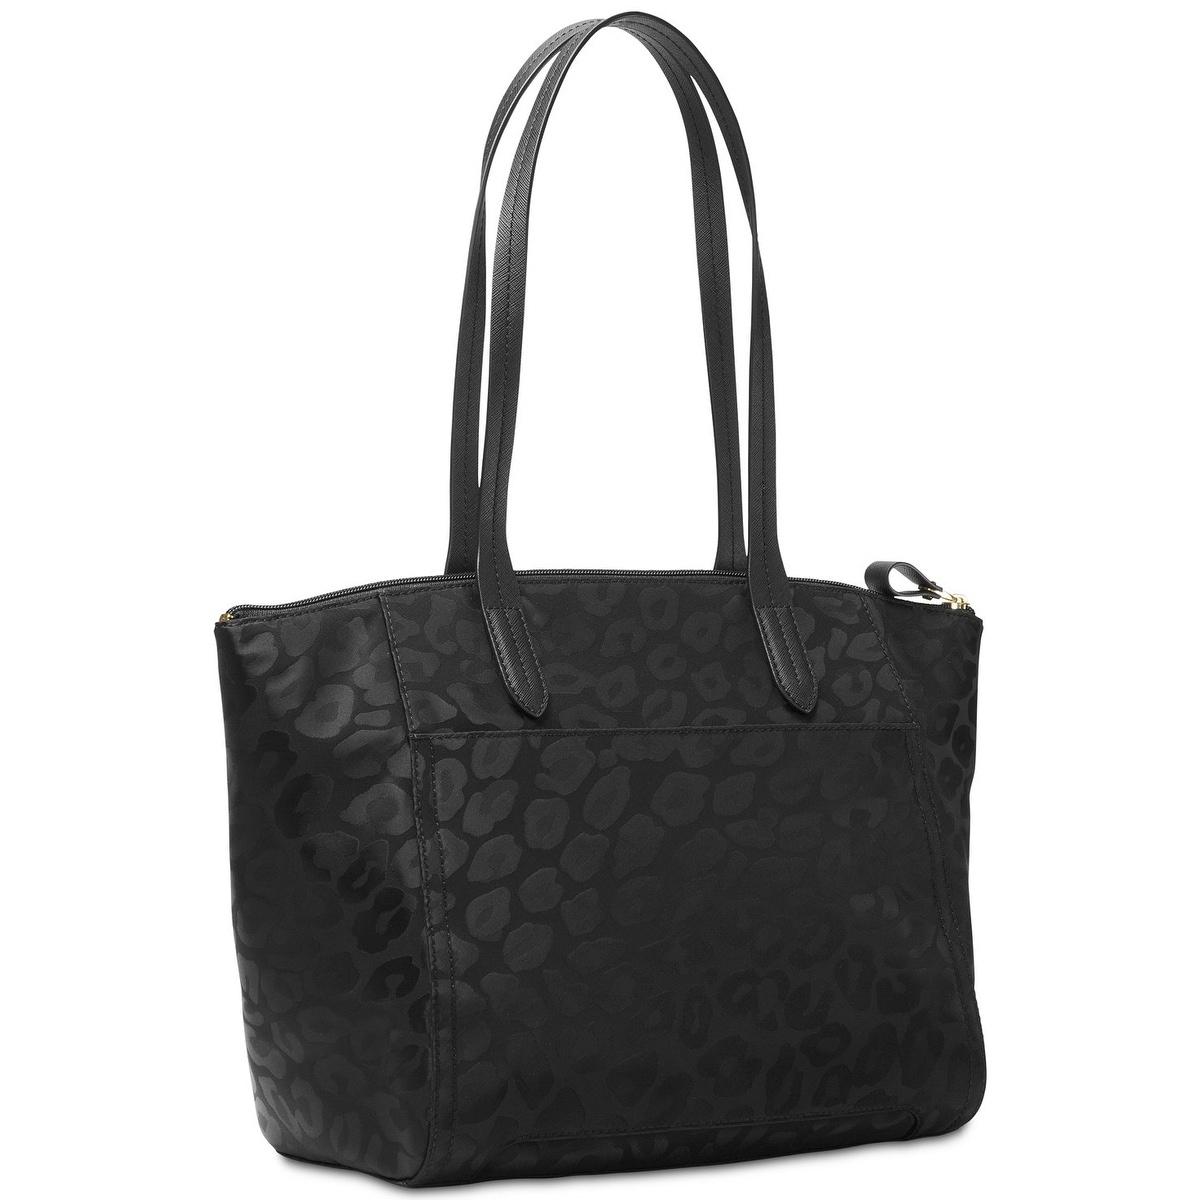 69e51be37da0 Shop Michael Michael Kors Kelsey Top-Zip Medium Tote - Black - Free  Shipping Today - Overstock - 18041291